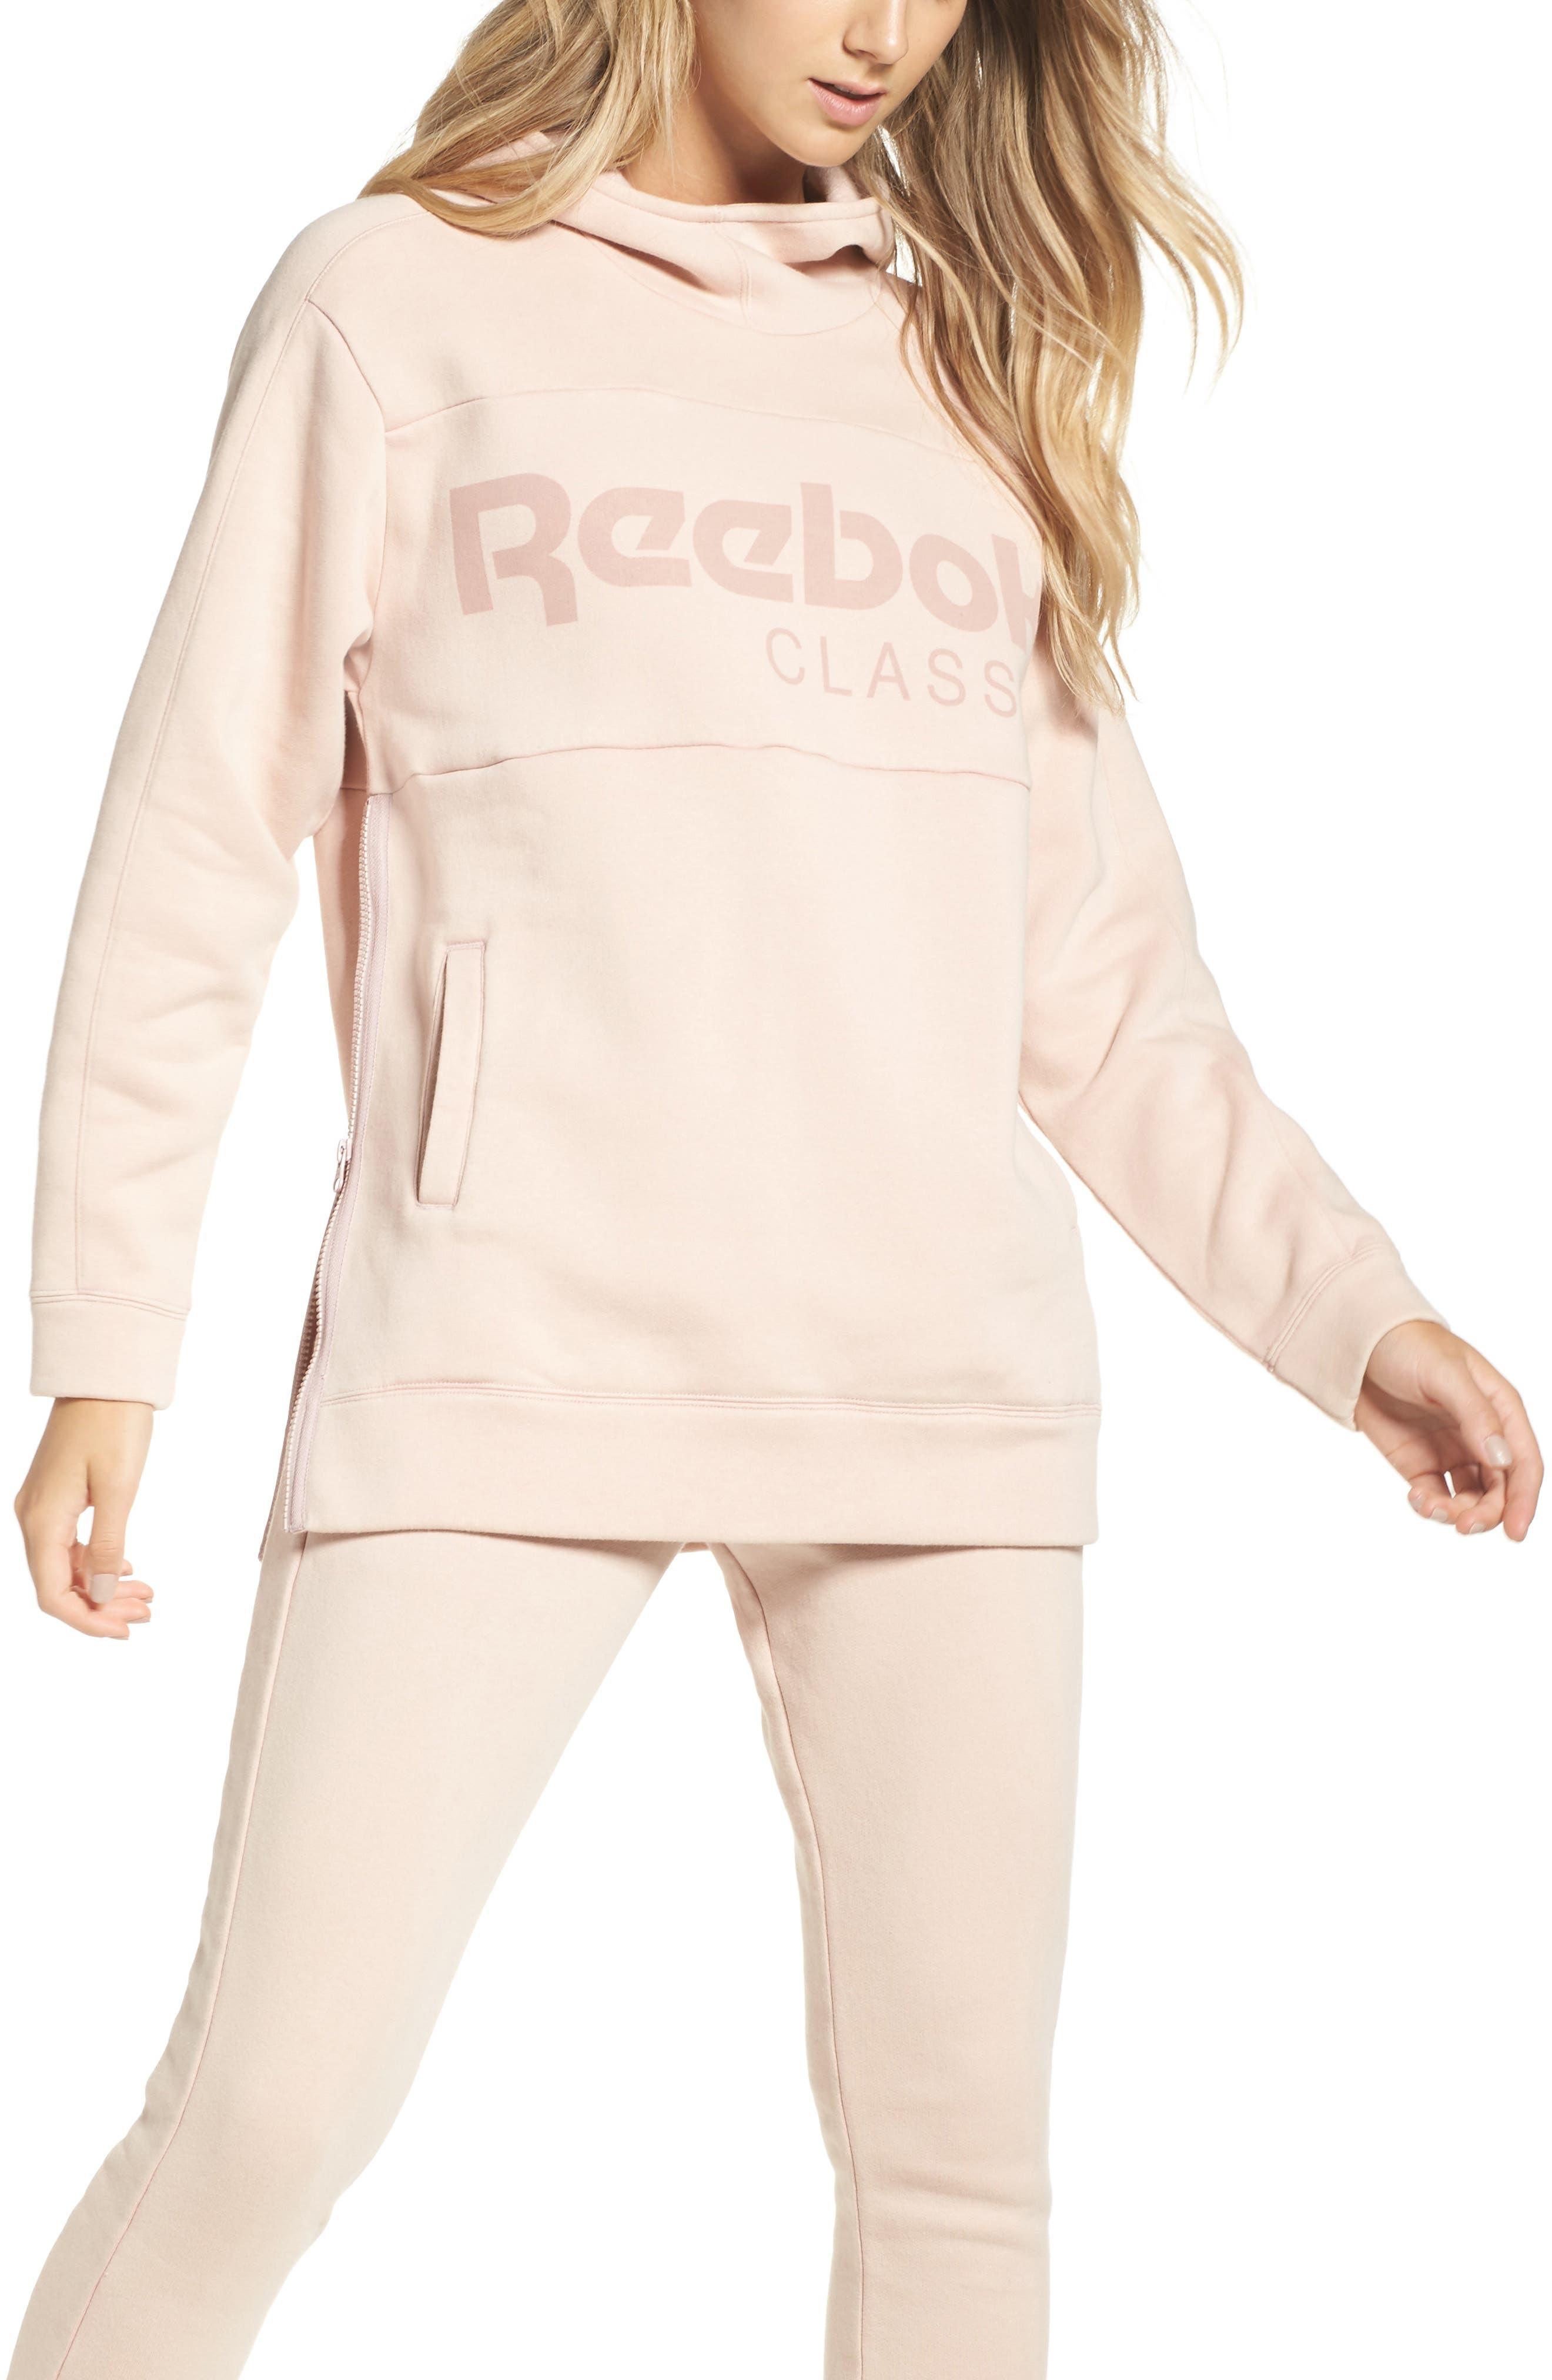 Reebok Oversize Graphic Hoodie